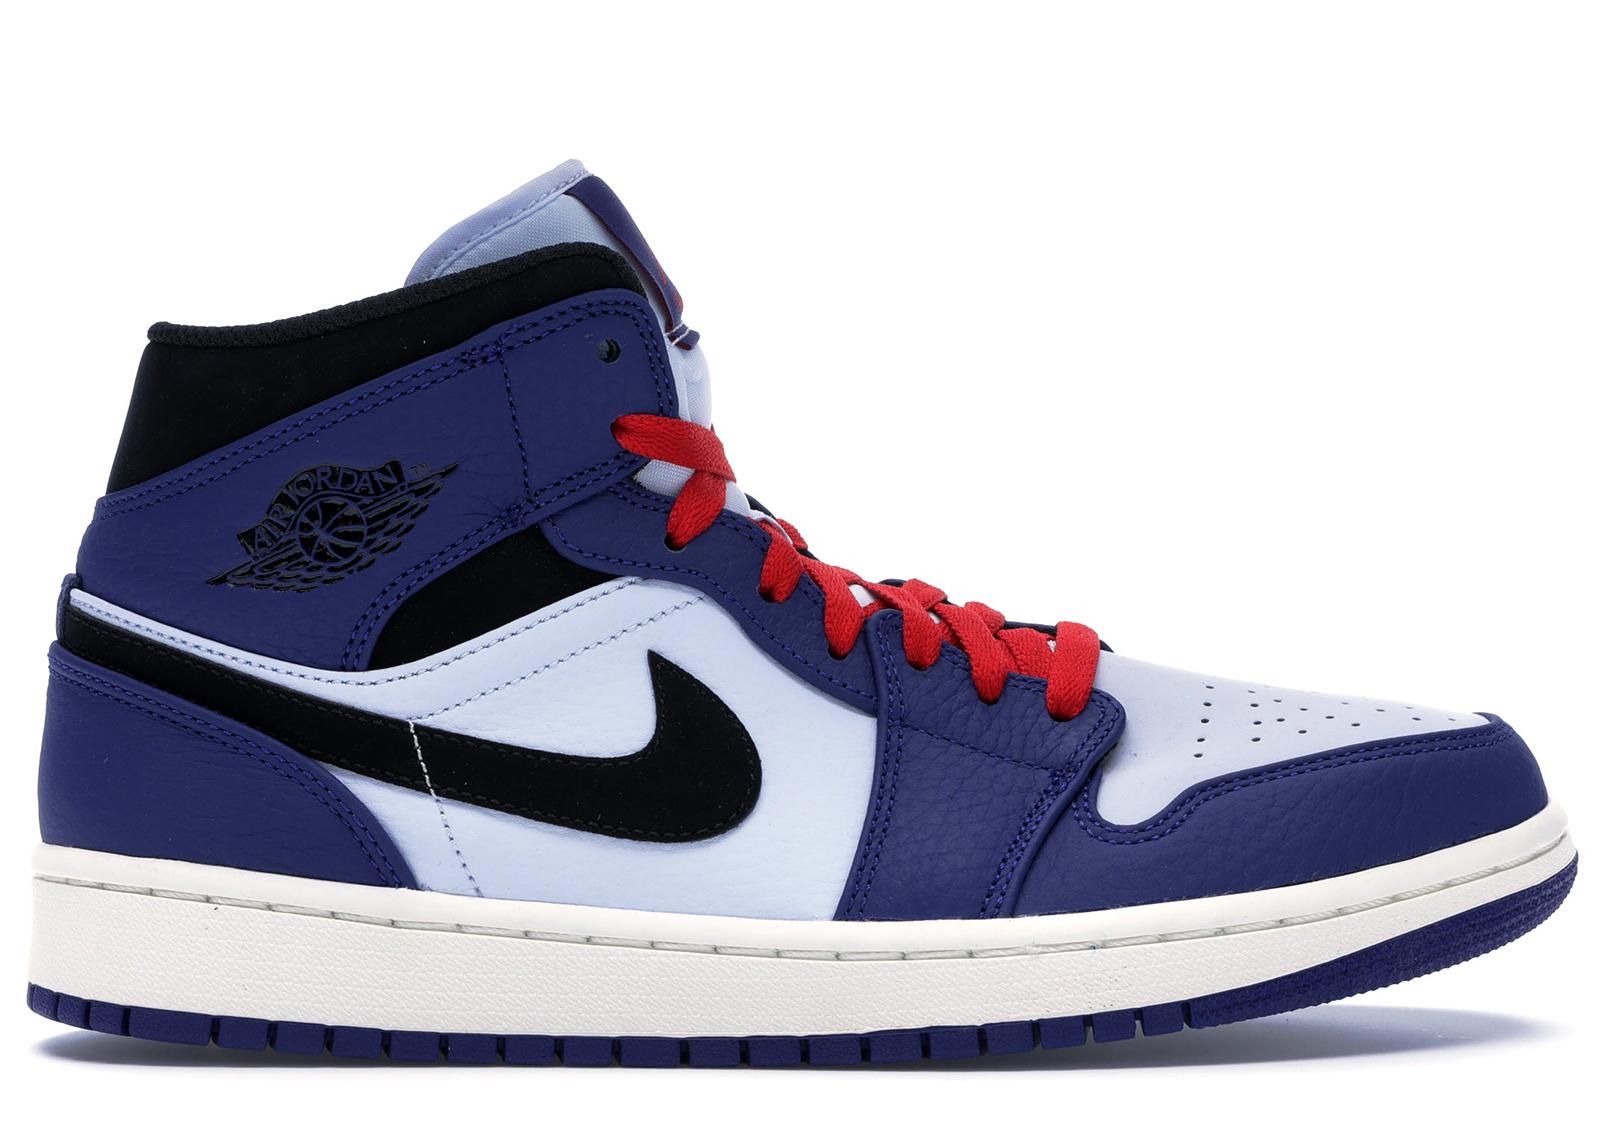 Jordan 1 Mid Deep Royal Blue Black